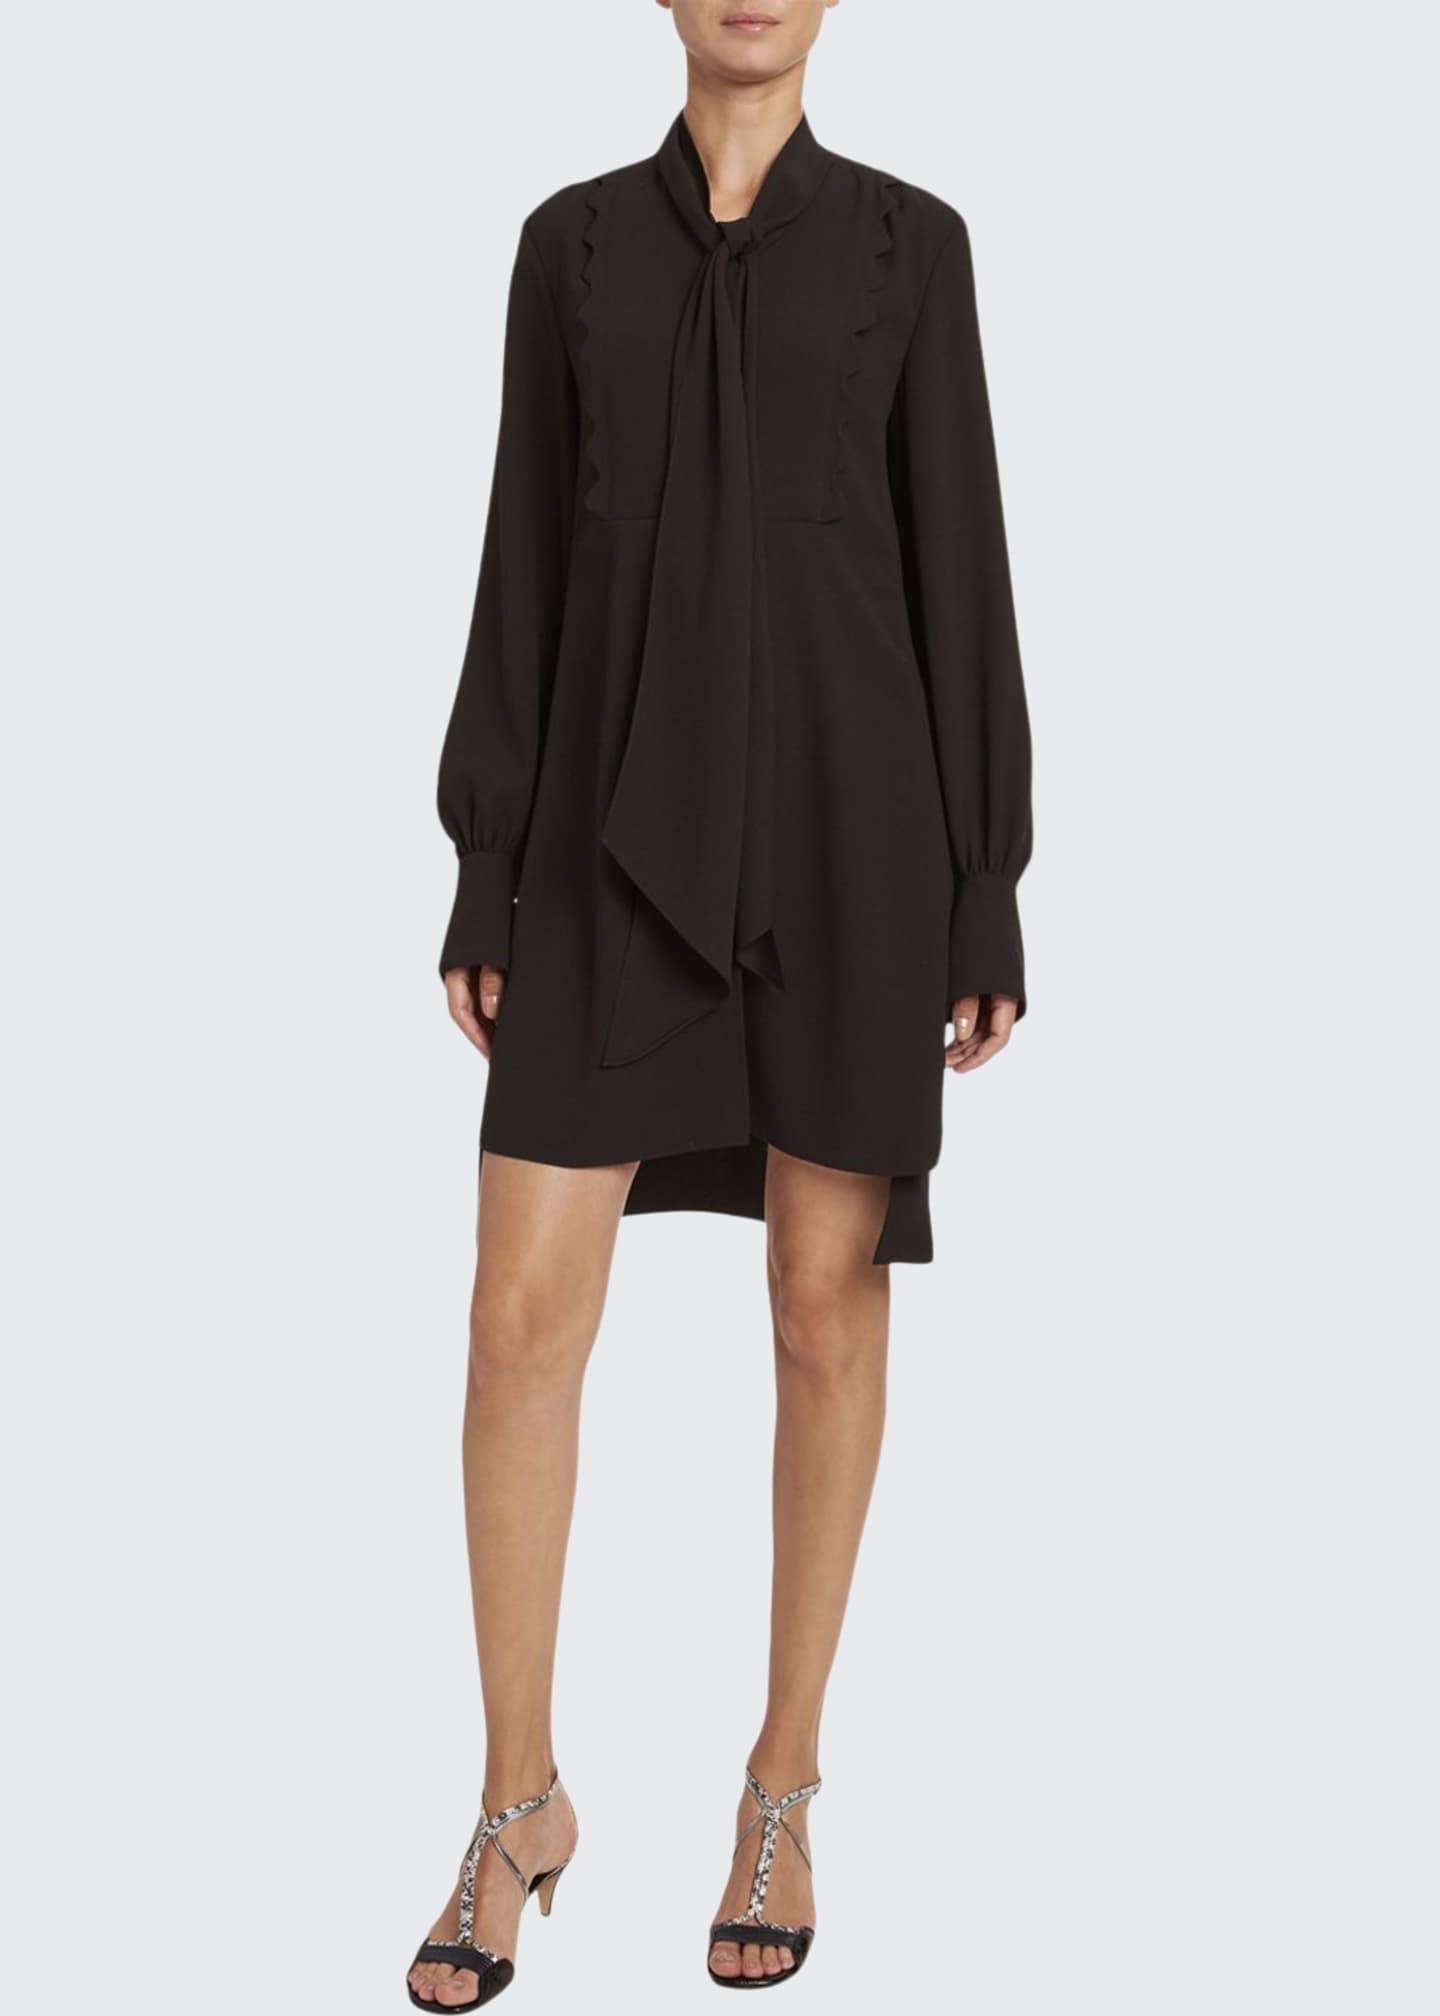 Chloe Satin-Back Crepe Short-Sleeve Dress